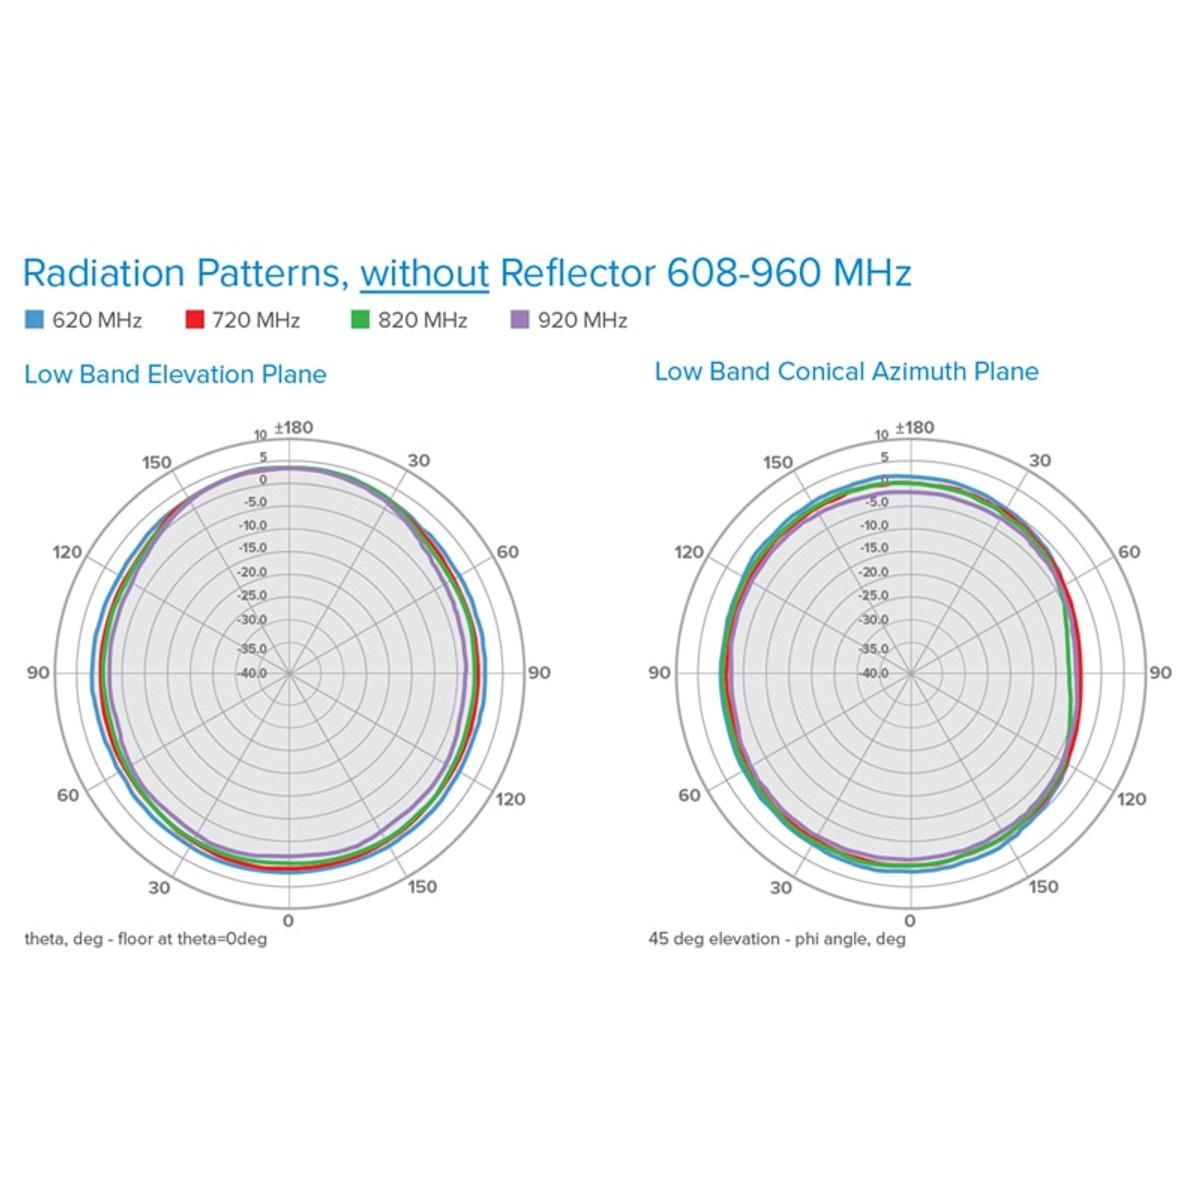 Wilson Electronics 4G Low-Profile Dome Antenna, 50 Ohm - 314407